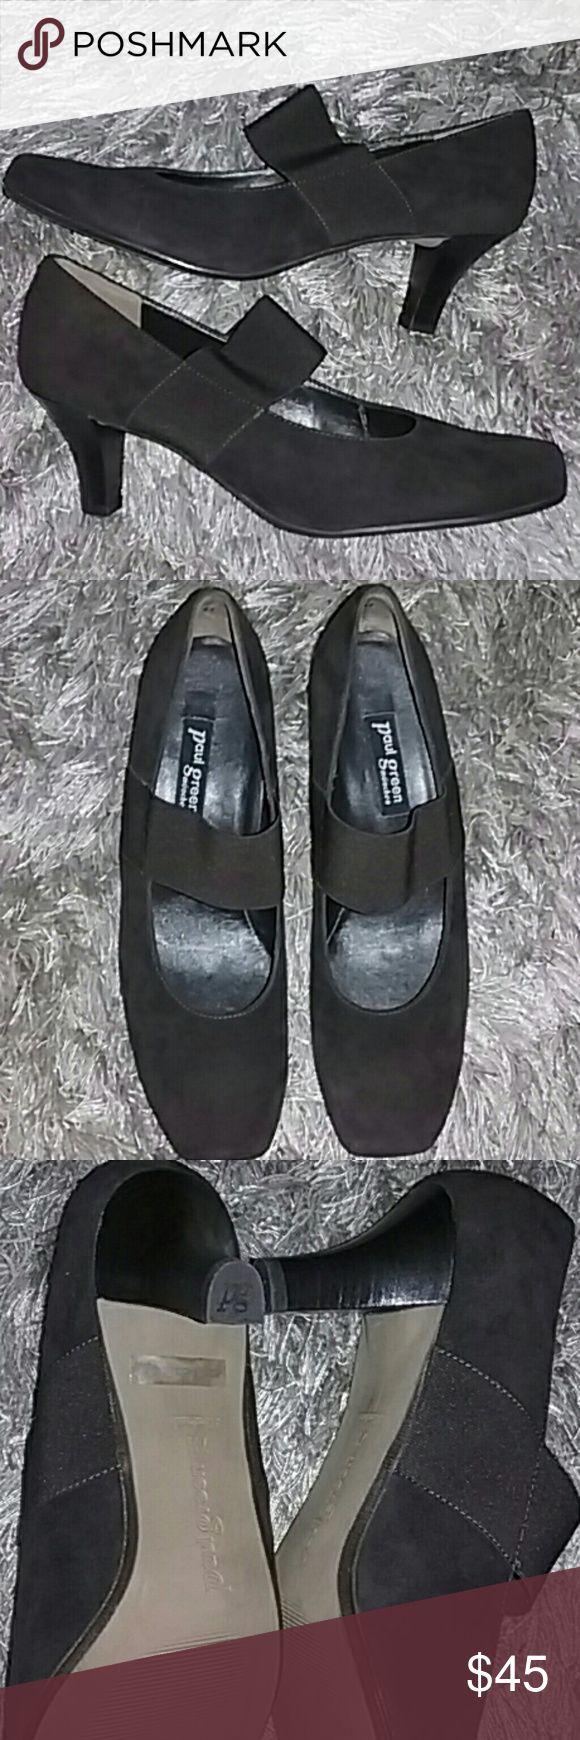 Paul Green Mary Jane suede pump new Paul Green Mary Jane suede pump brand new never worn in size 10 us Paul Green Shoes Heels